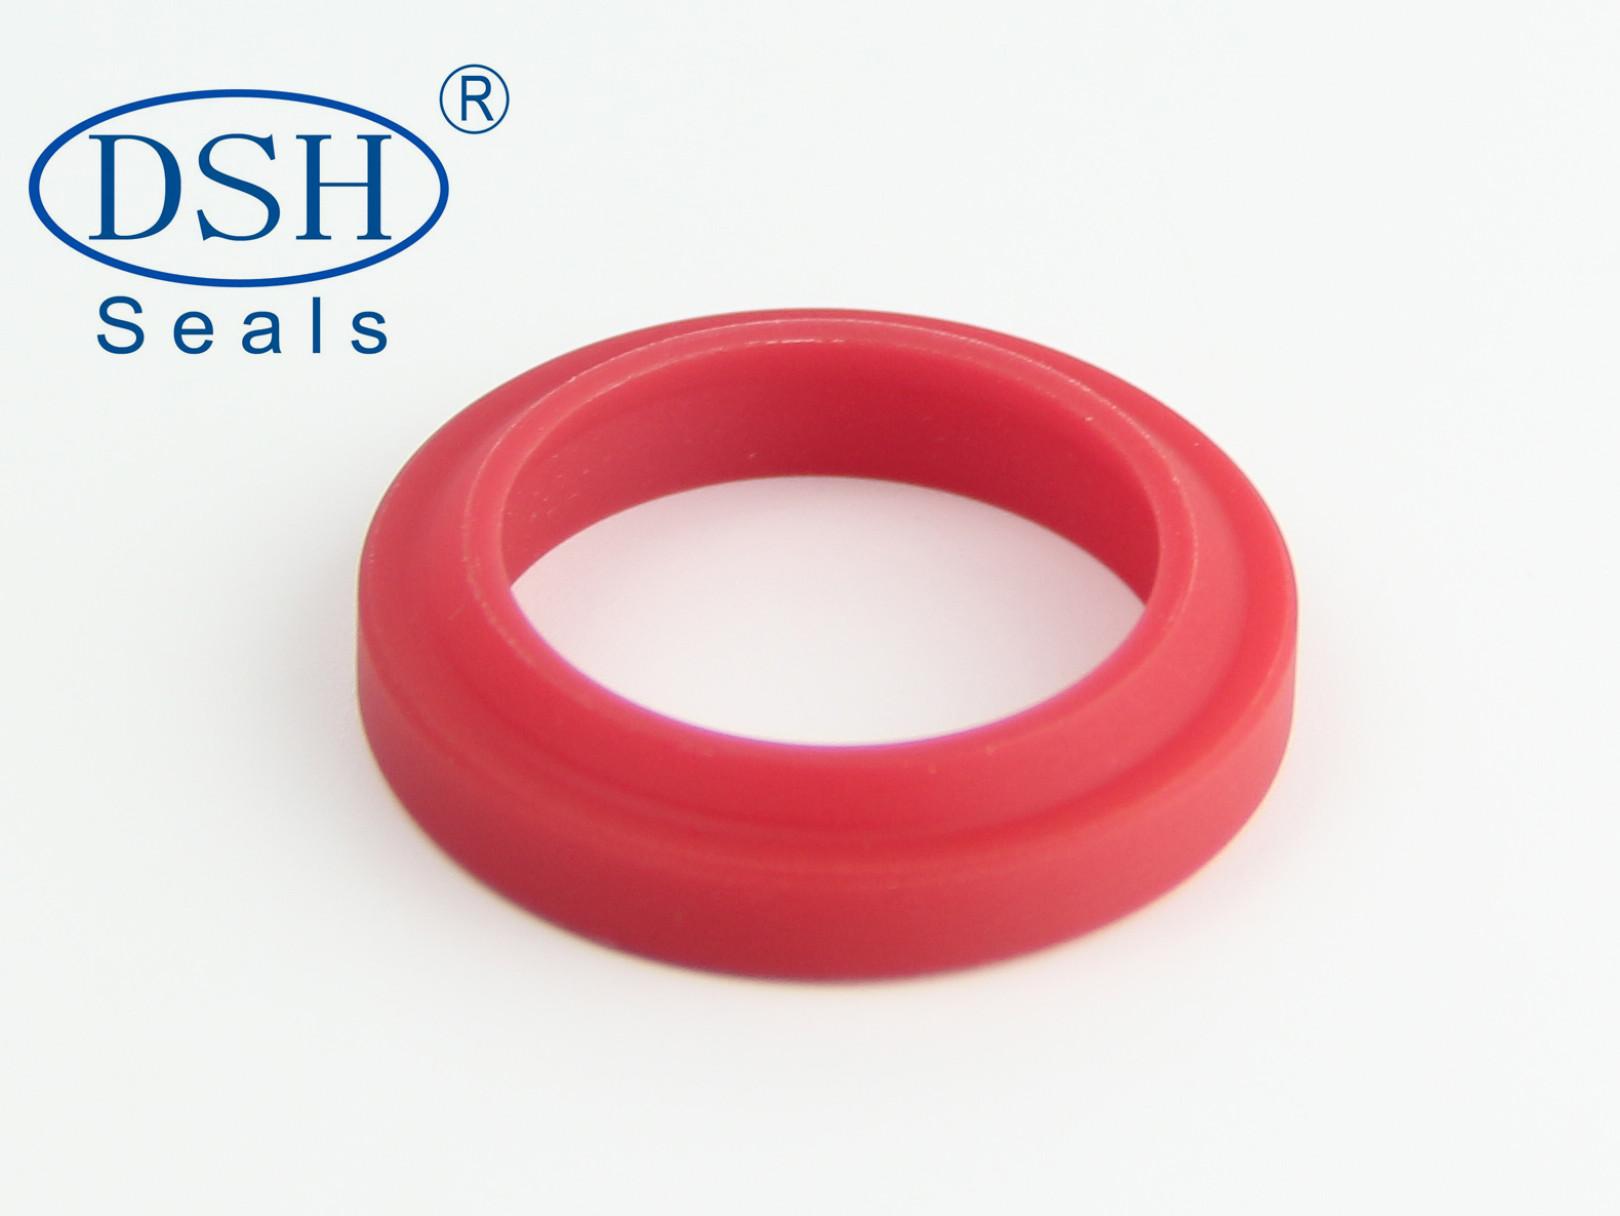 Scrapers DAH wiper sealing ring and hydraulic seals